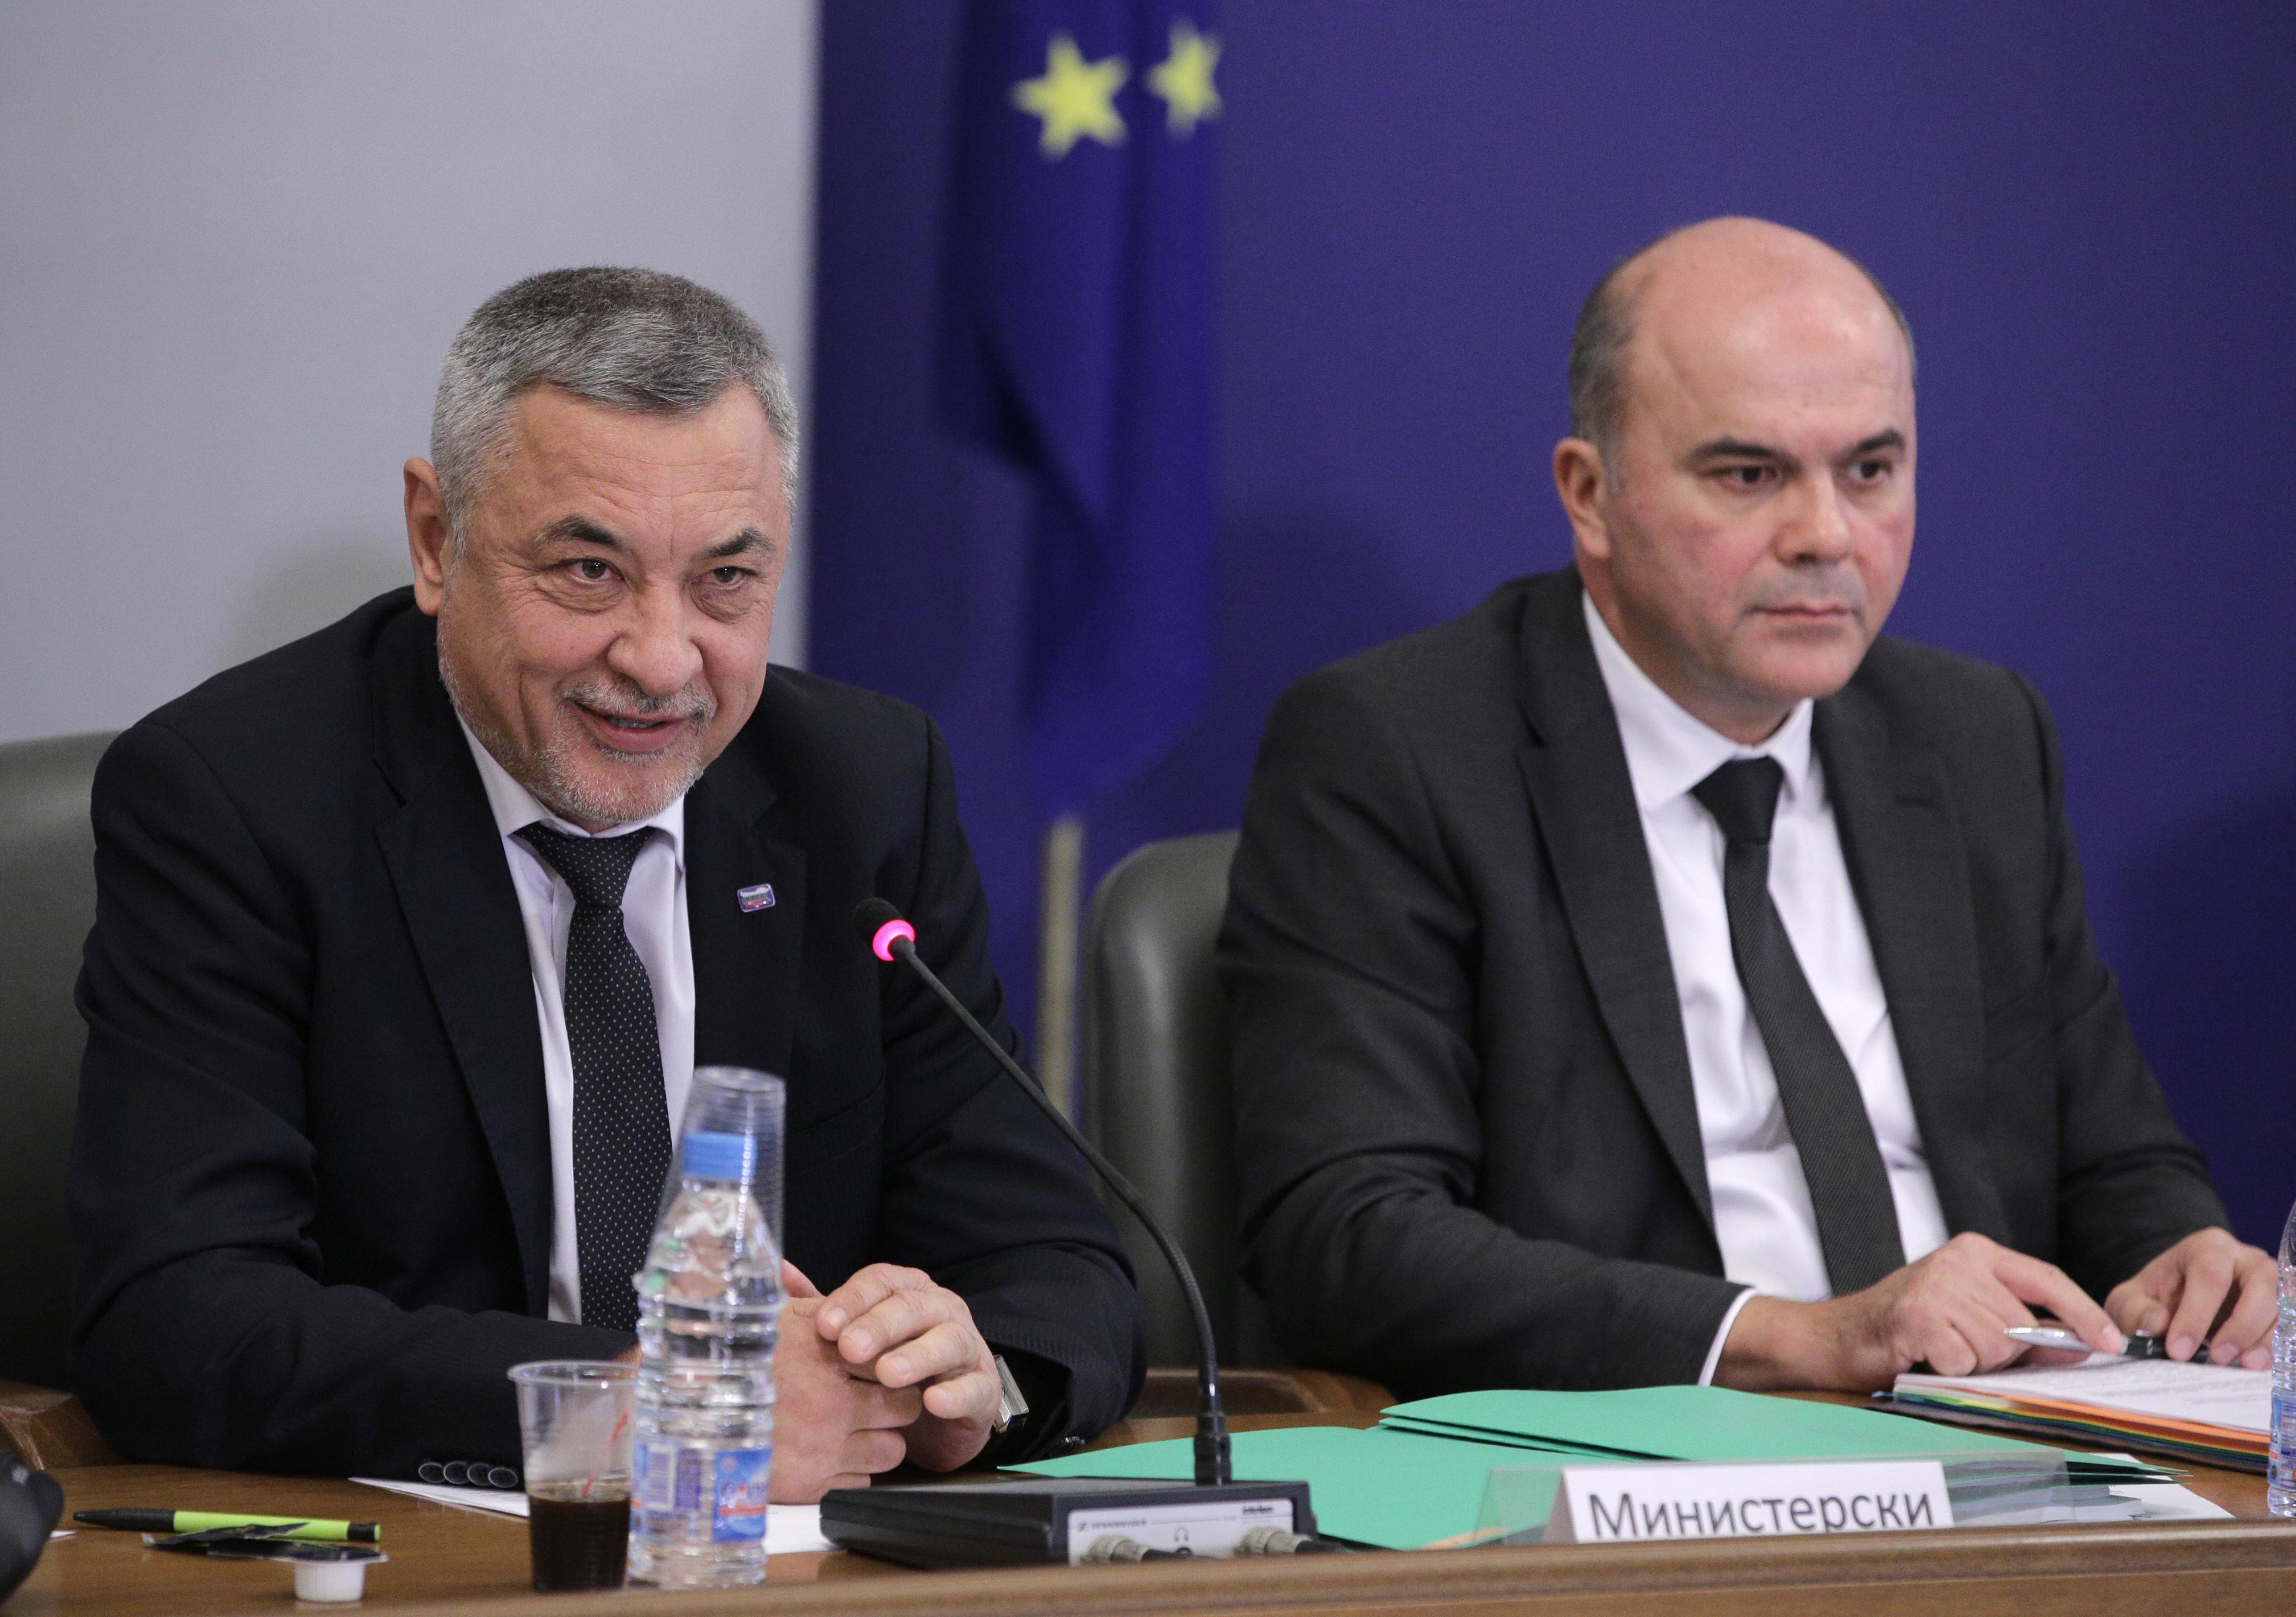 Бисер Петков: Пенсии ще има до 2037 г., после не се знае